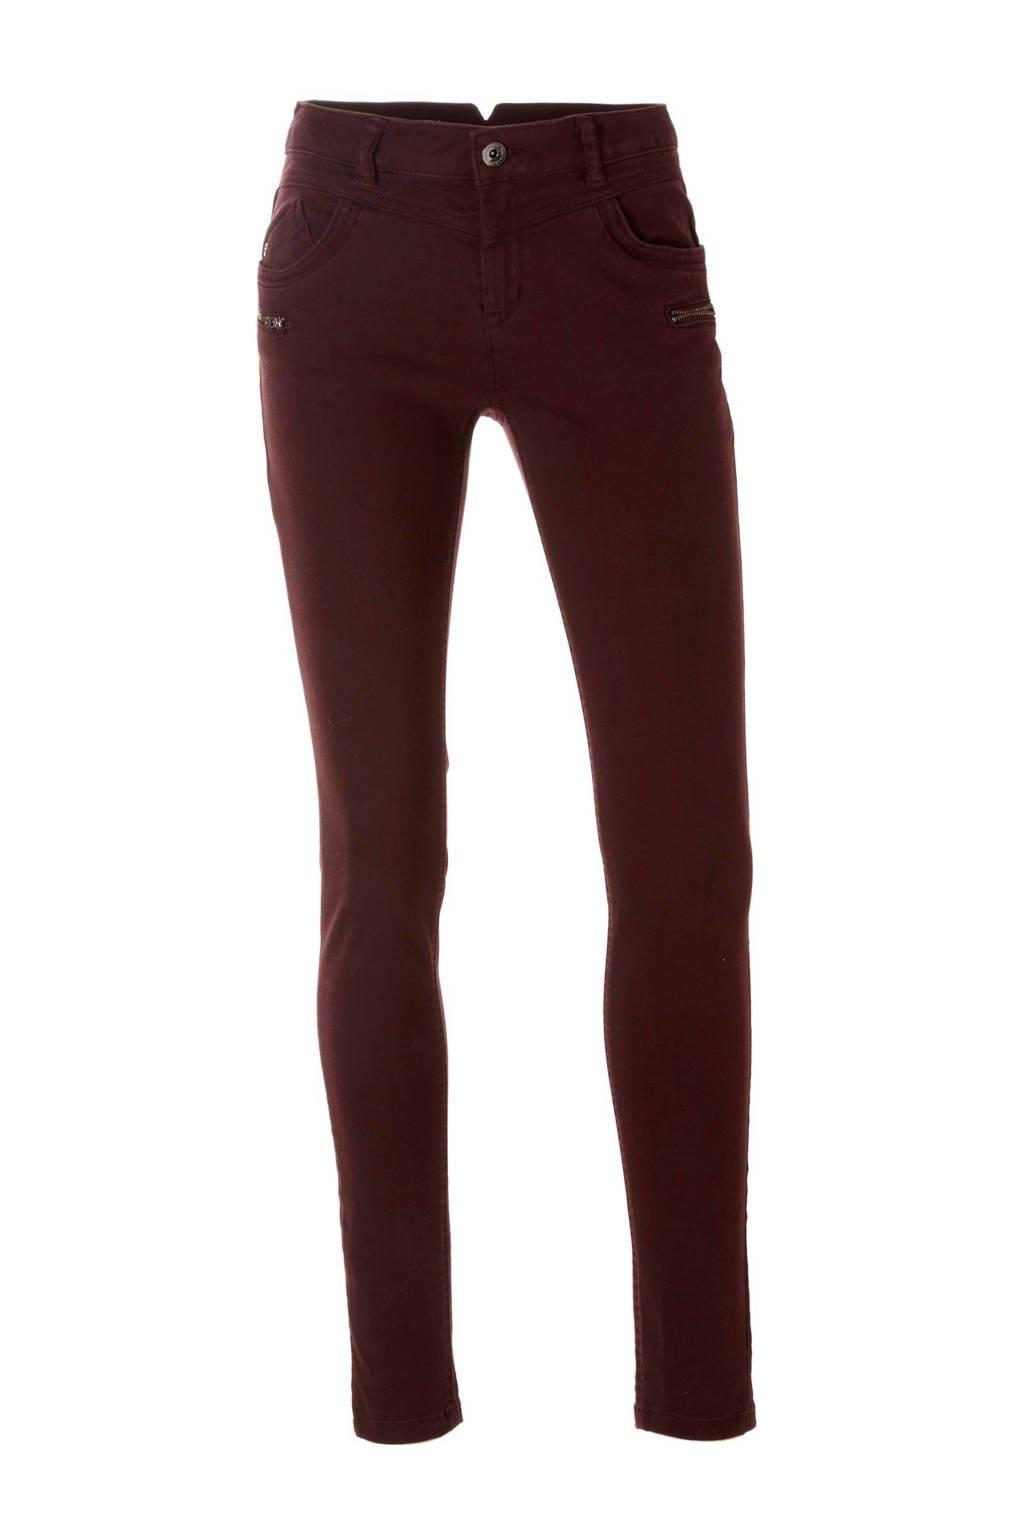 C&A Yessica skinny fit broek, Donkerrood